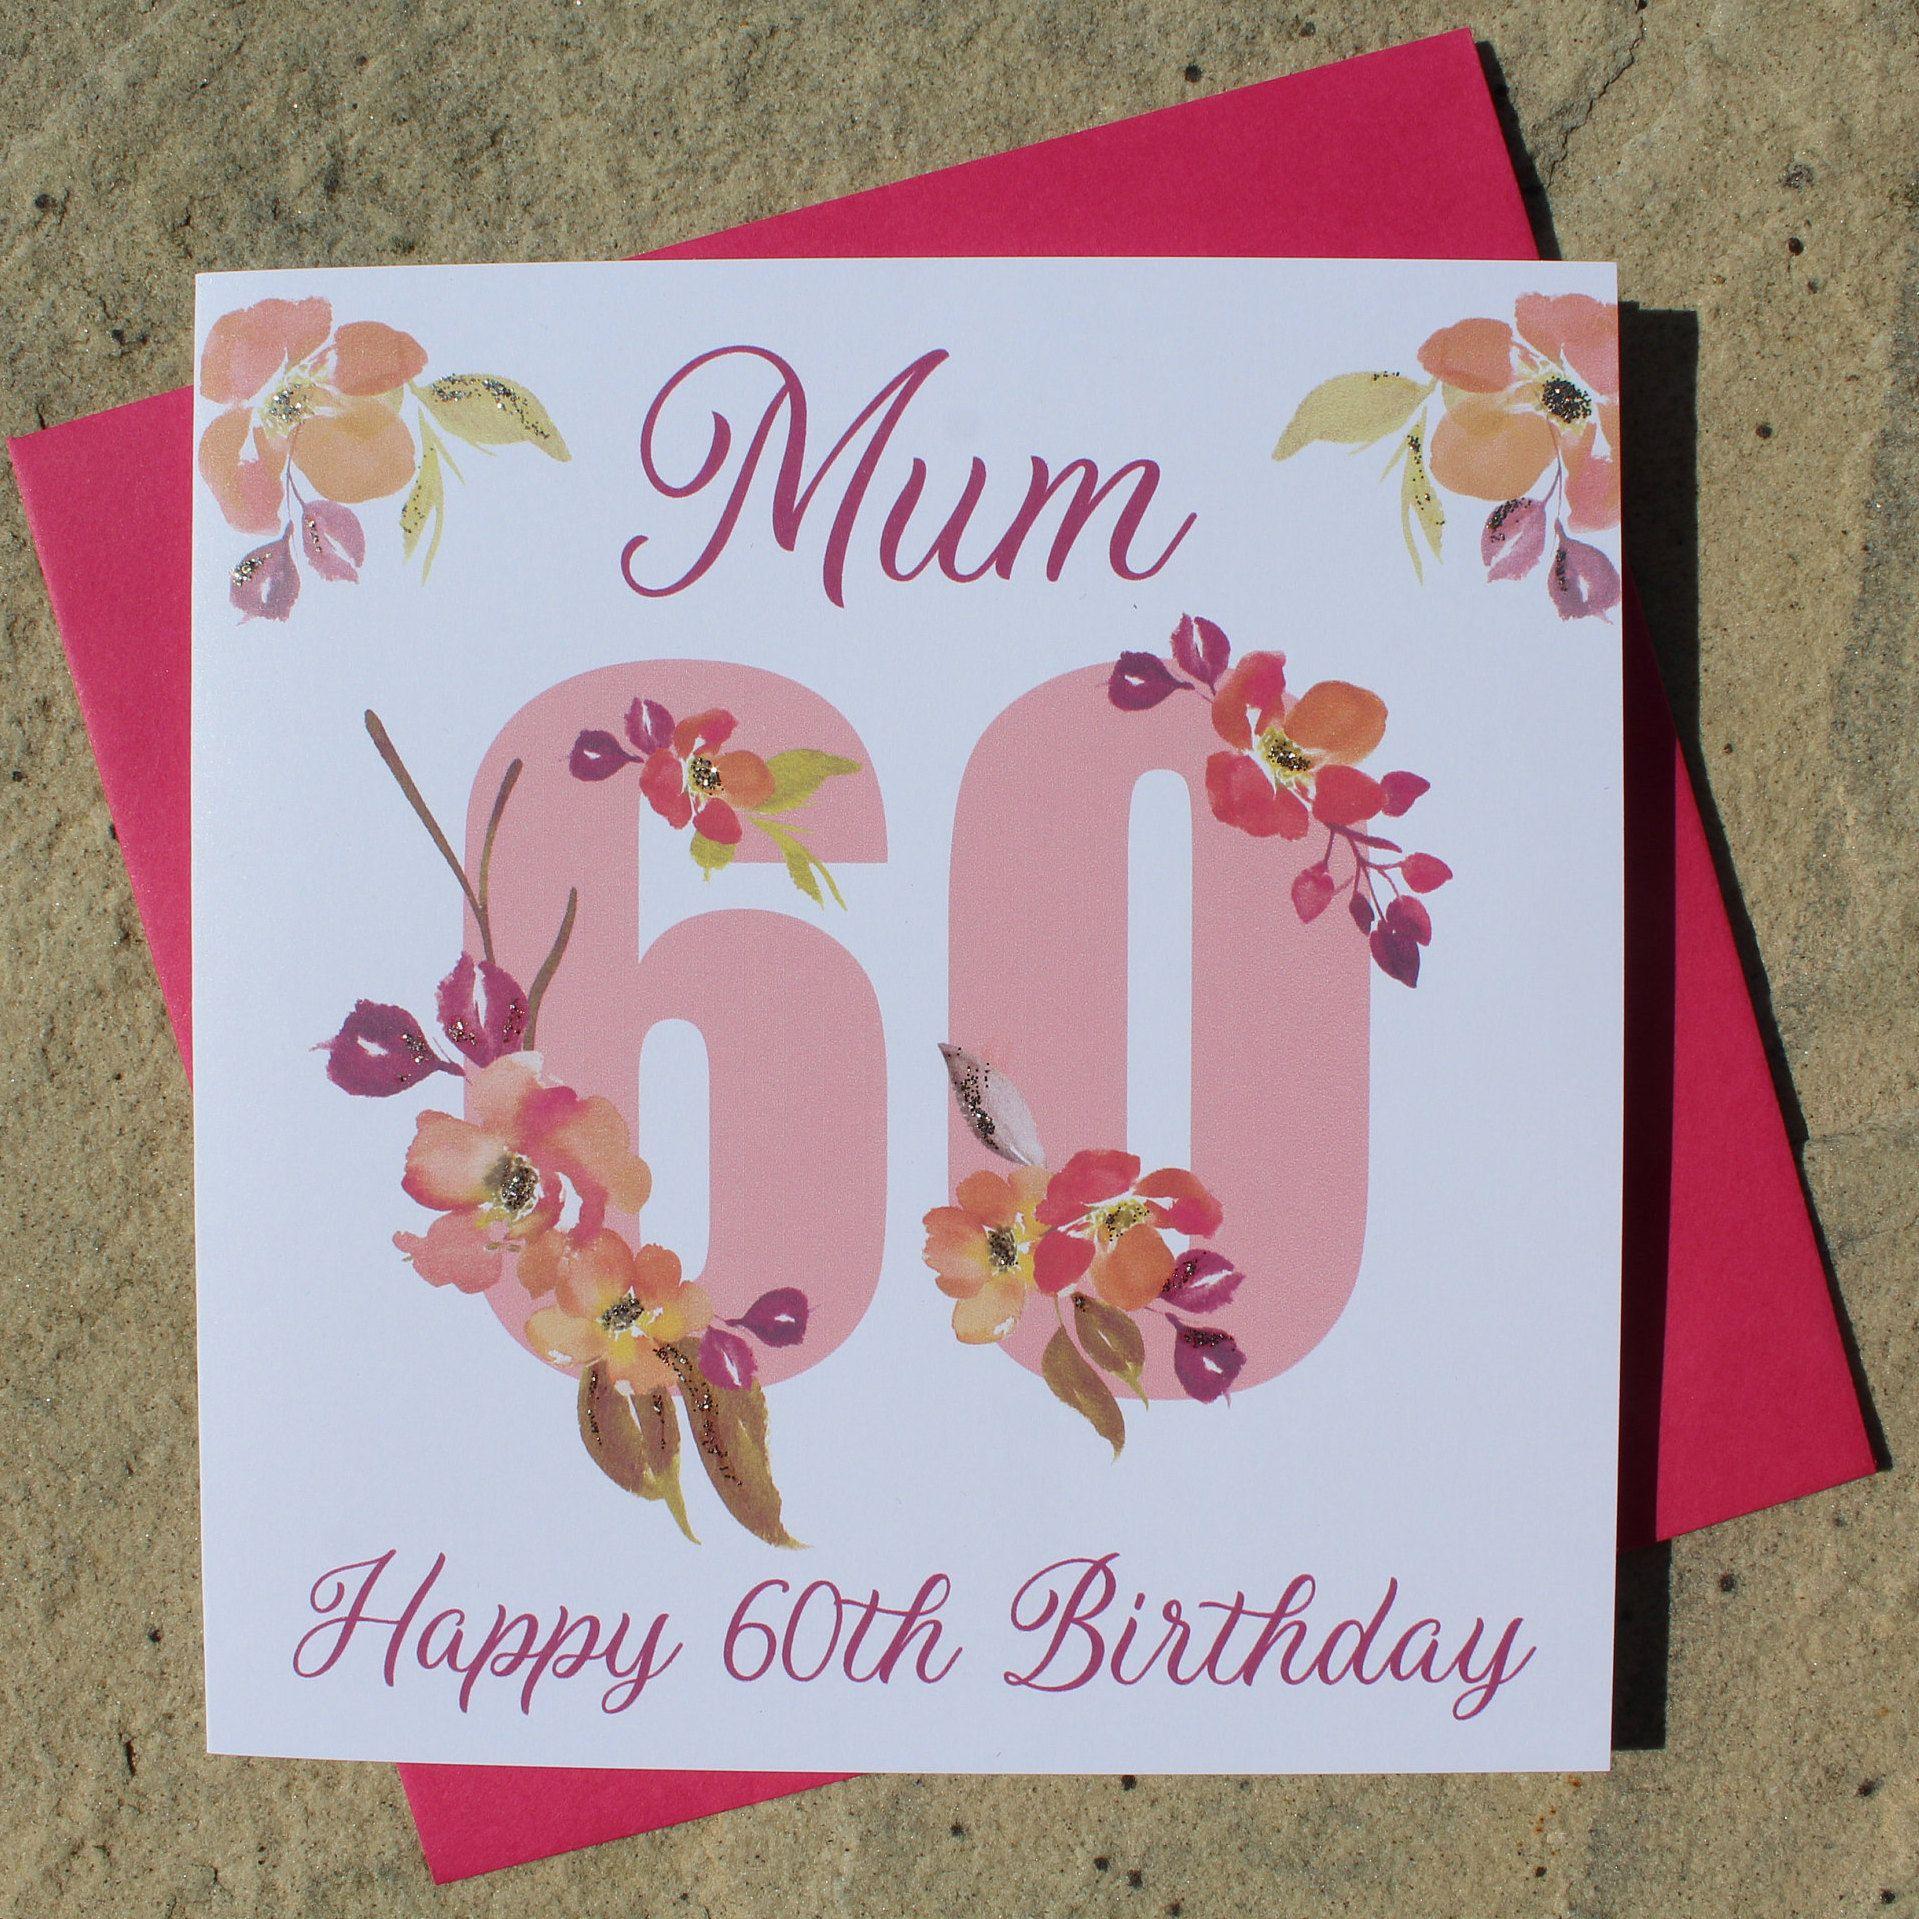 Niece Cake Card Friend Handmade Happy Birthday Special Mum Sister Nan